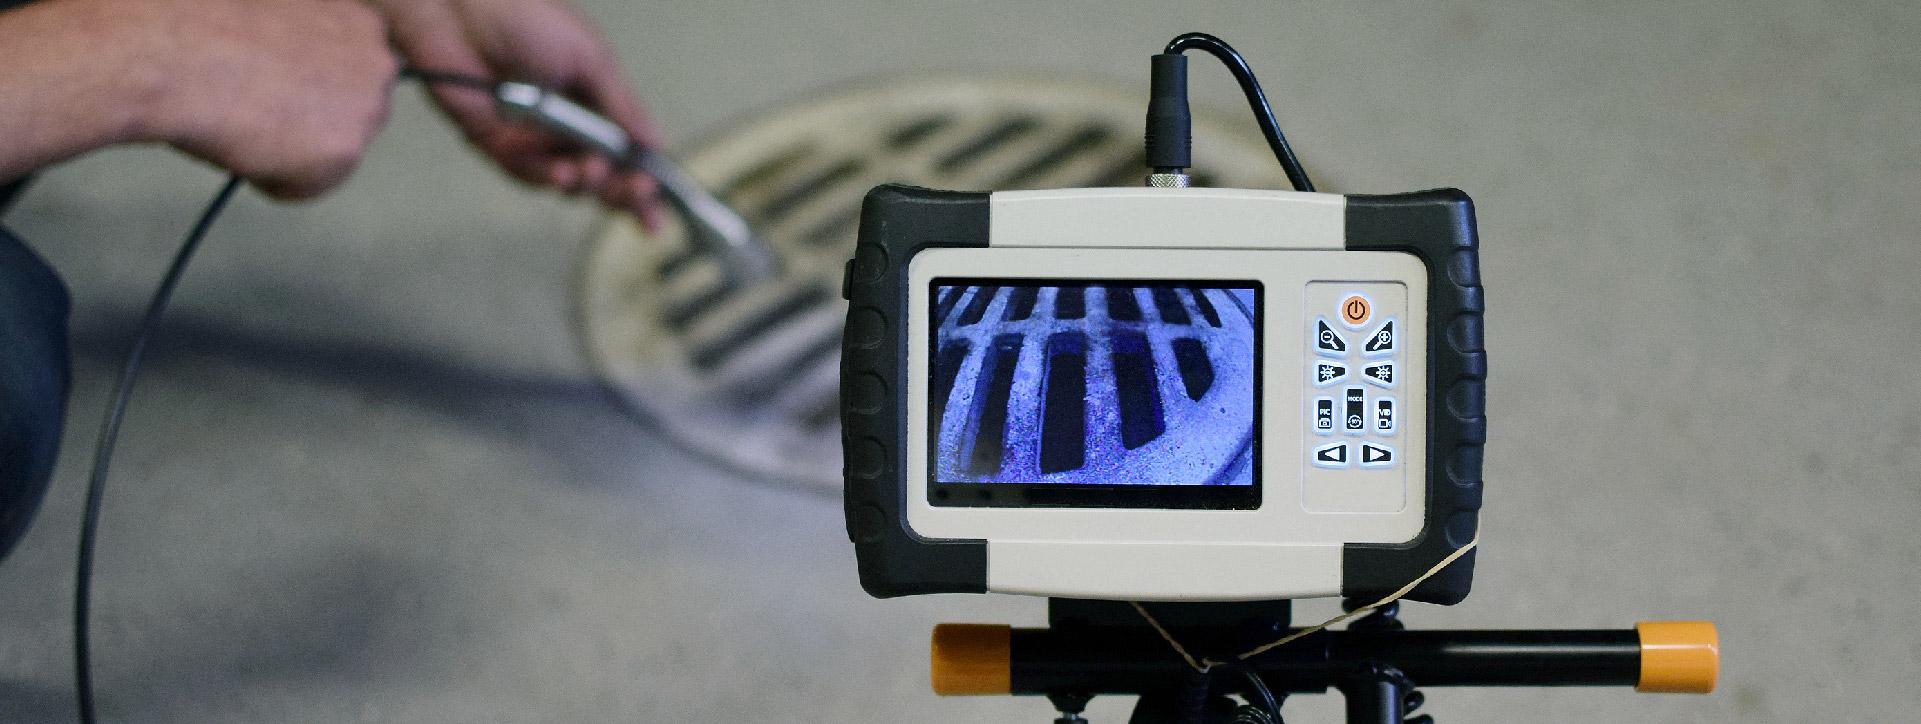 Video Drain Inspection